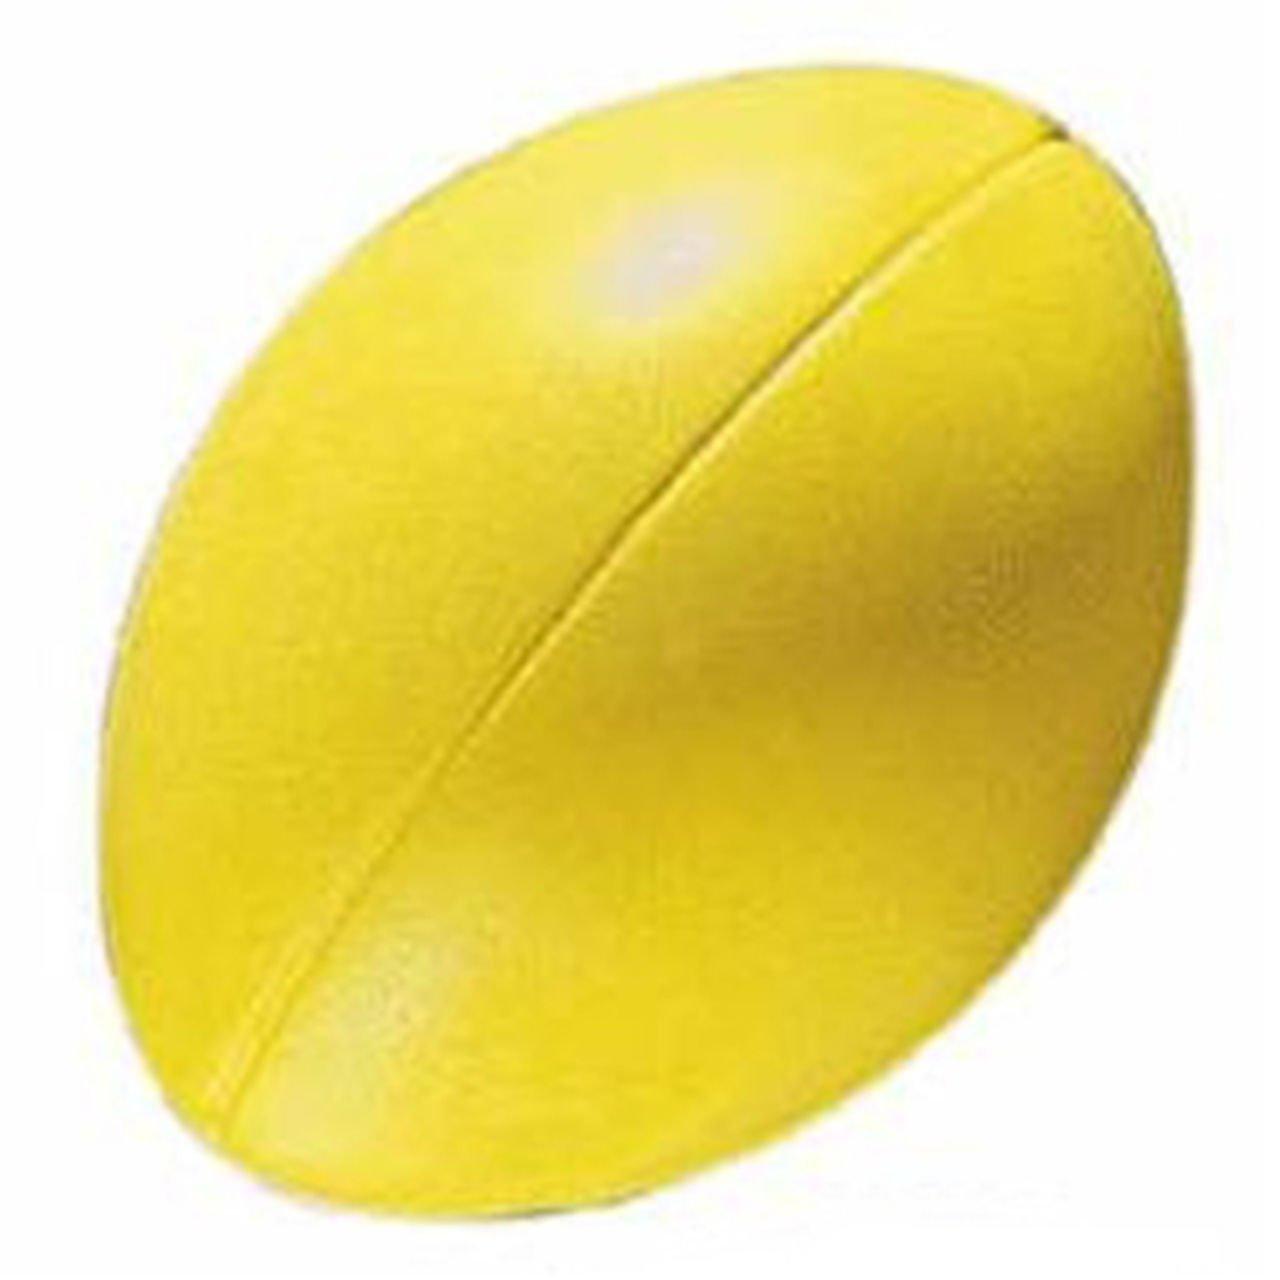 Soft Sponge Rugby Ball Lightweight Indoor & Outdoor Playing Foam Balls Yellow OSG